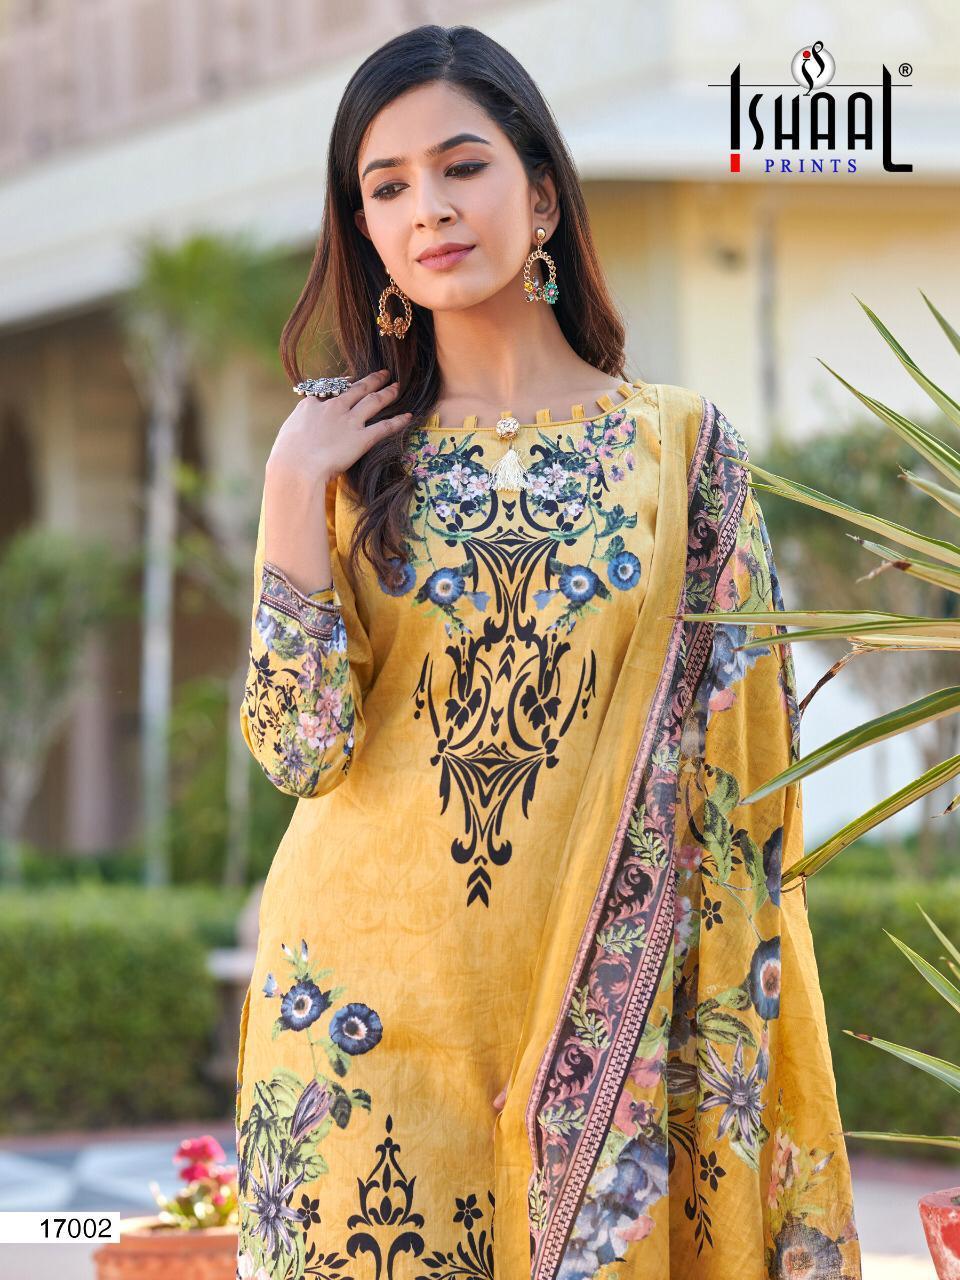 Ishaal Gulmohar Vol 17 Salwar Suit Wholesale Catalog 10 Pcs 20 - Ishaal Gulmohar Vol 17 Salwar Suit Wholesale Catalog 10 Pcs